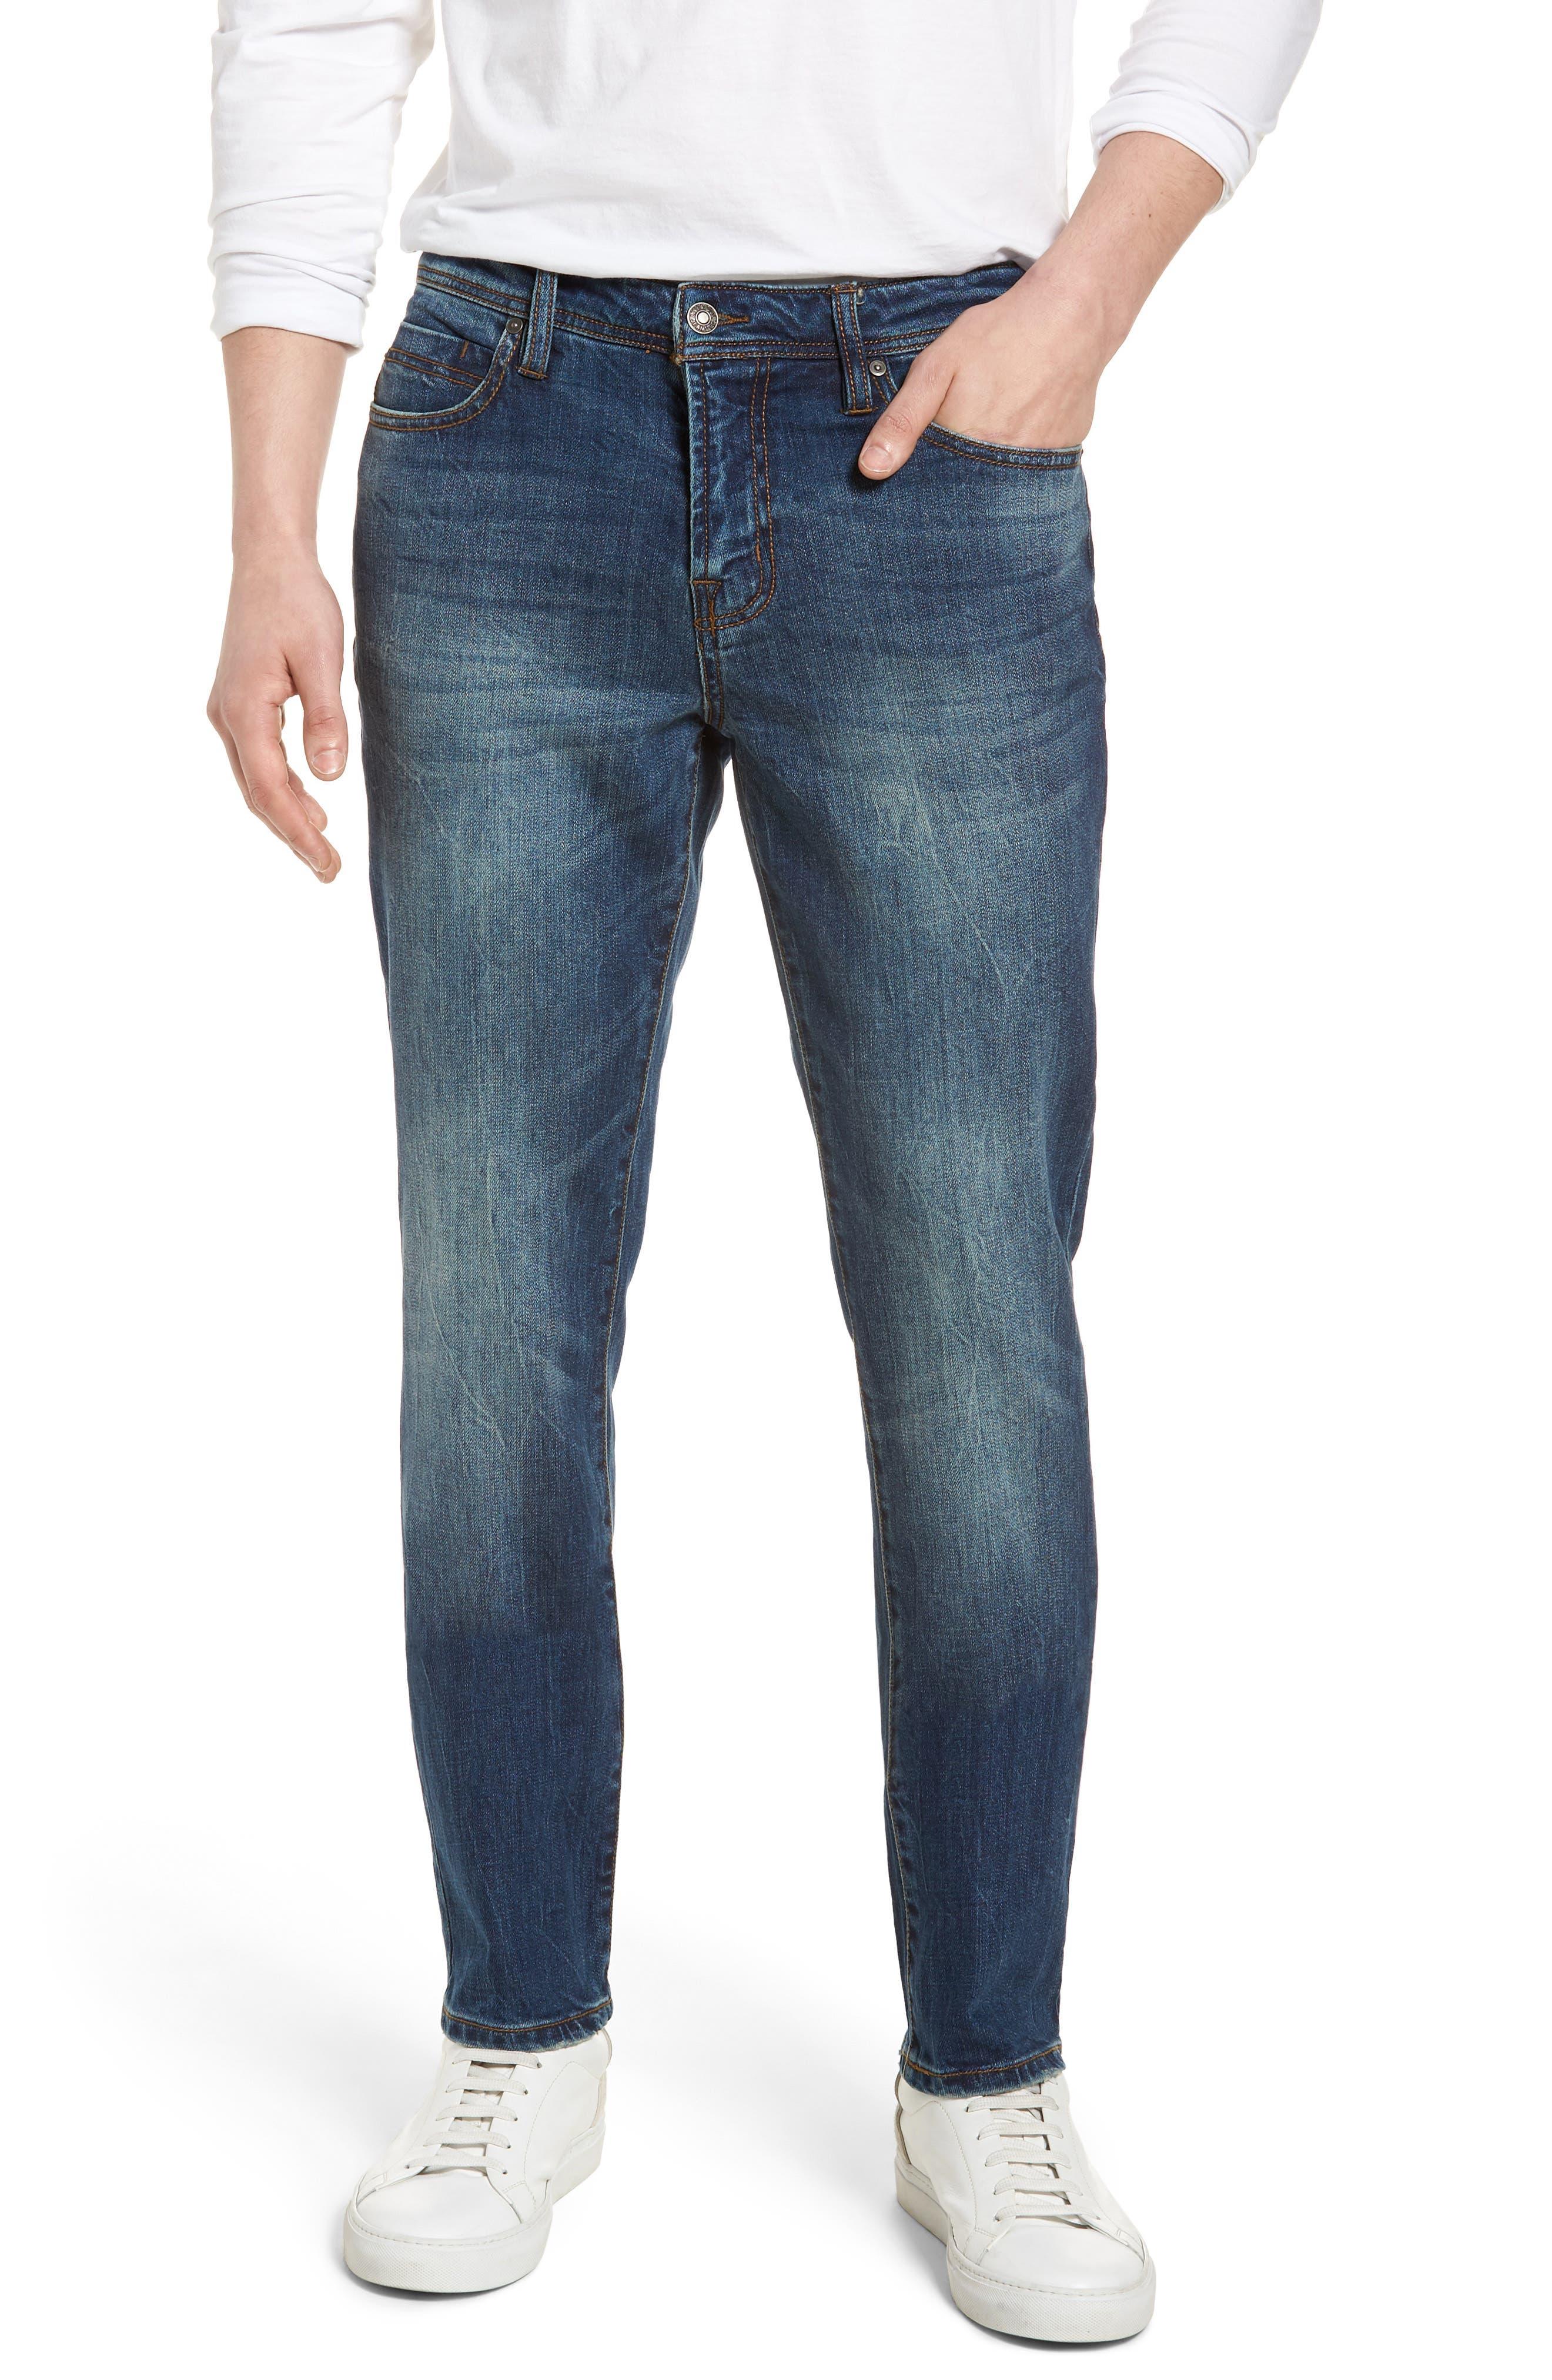 Jeans Co. Kingston Slim Straight Leg Jeans,                         Main,                         color, Odessa Vintage Dark